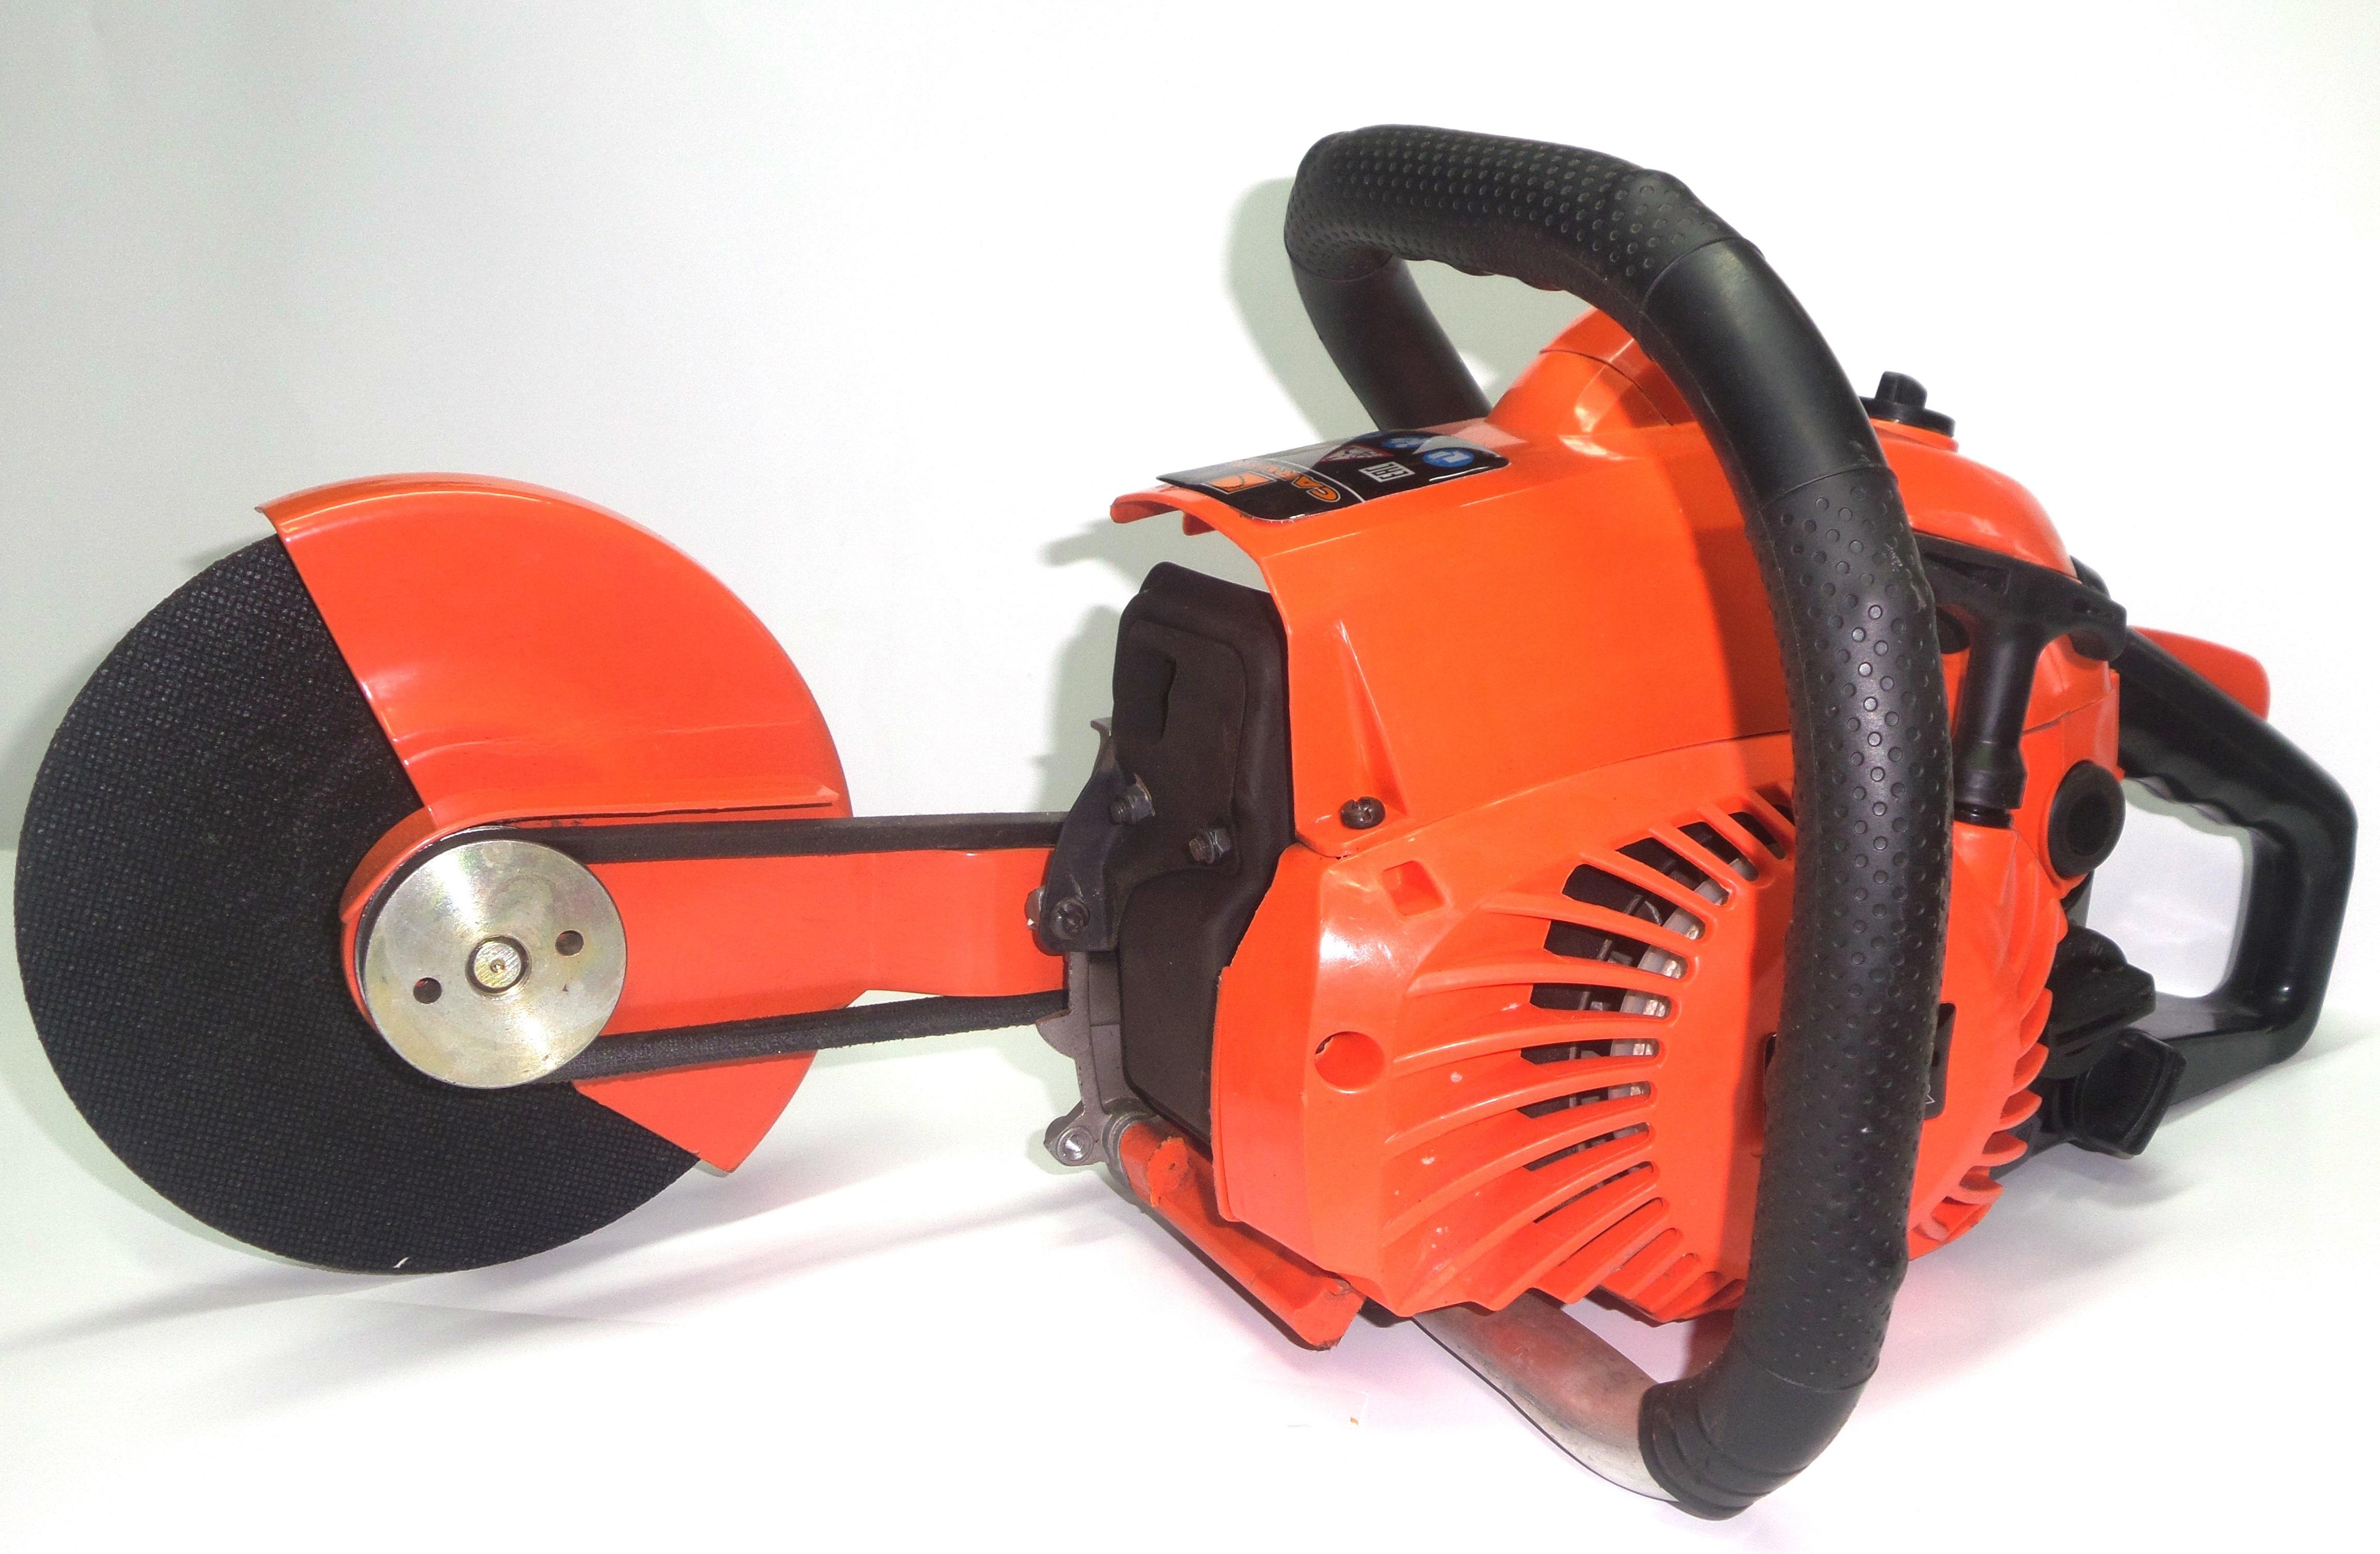 Насадка болгарка НМЗ 94 silver streak 290292 throttle control cable for husqvarna 577 52 94 01 husqvarna 577 52 94